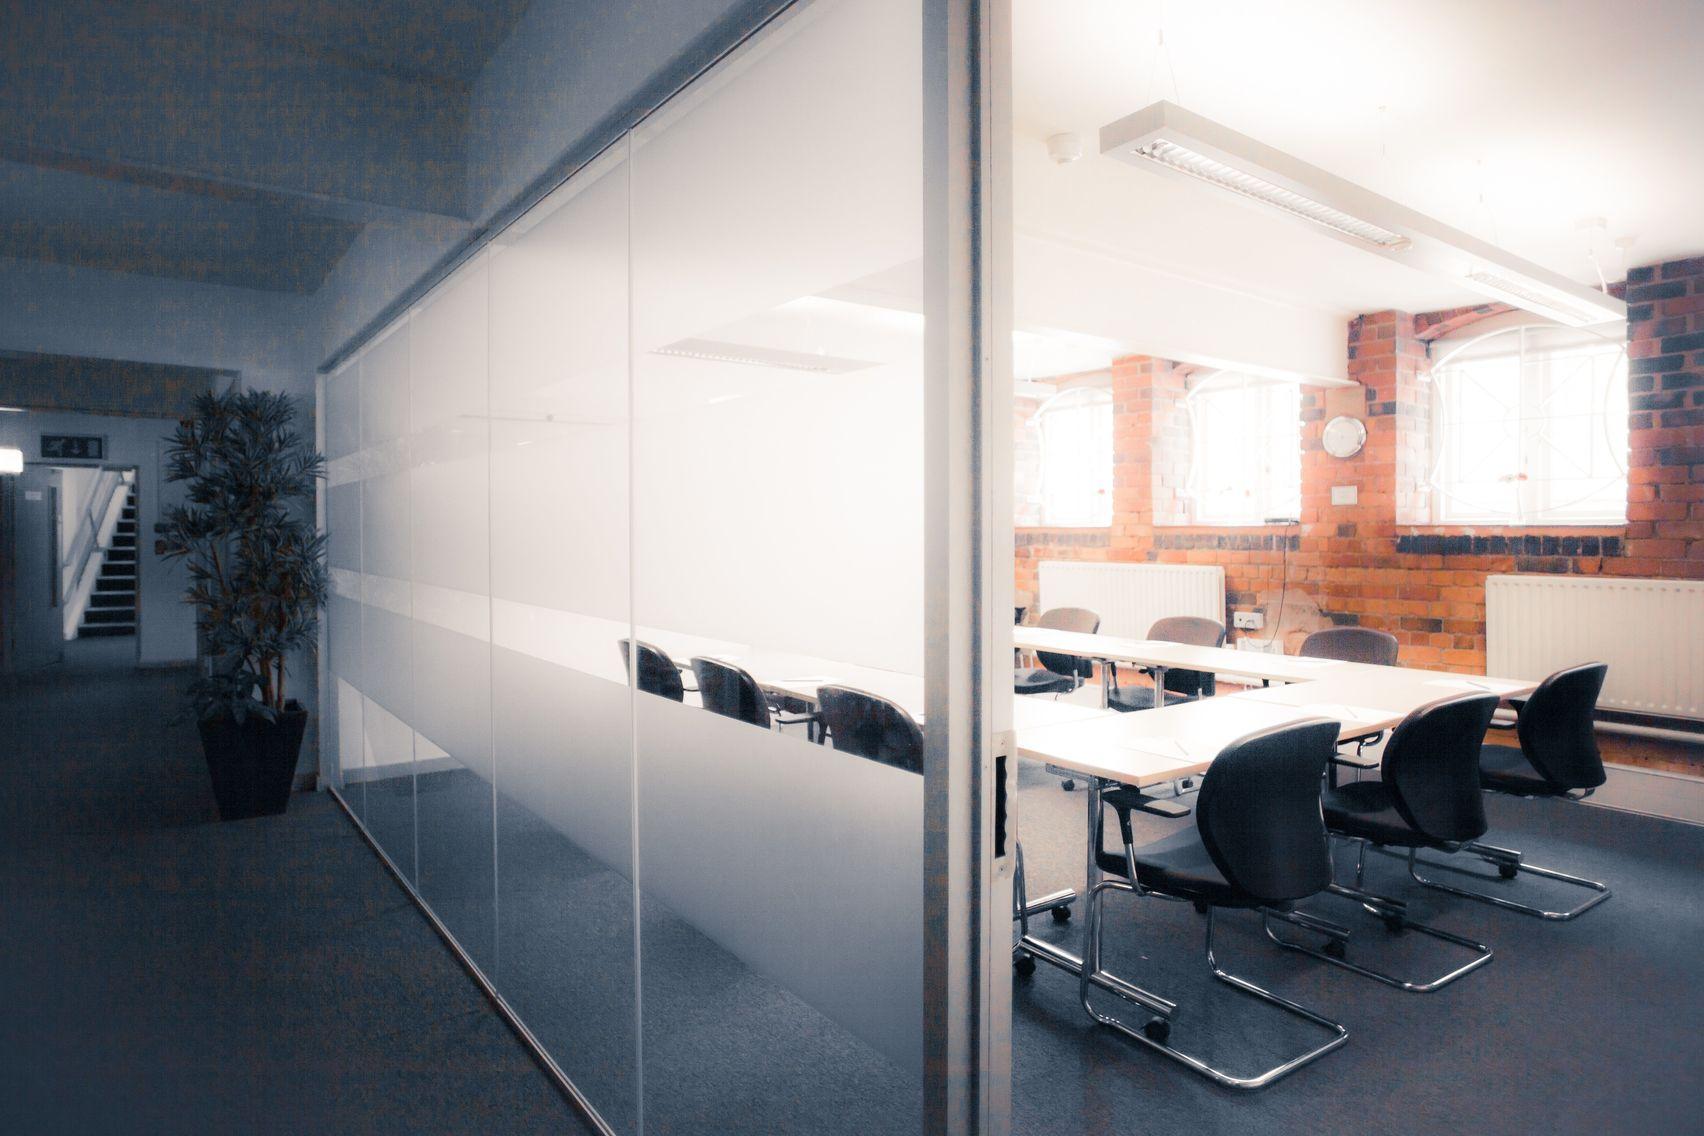 Fairbank Room, Lockside Meetings